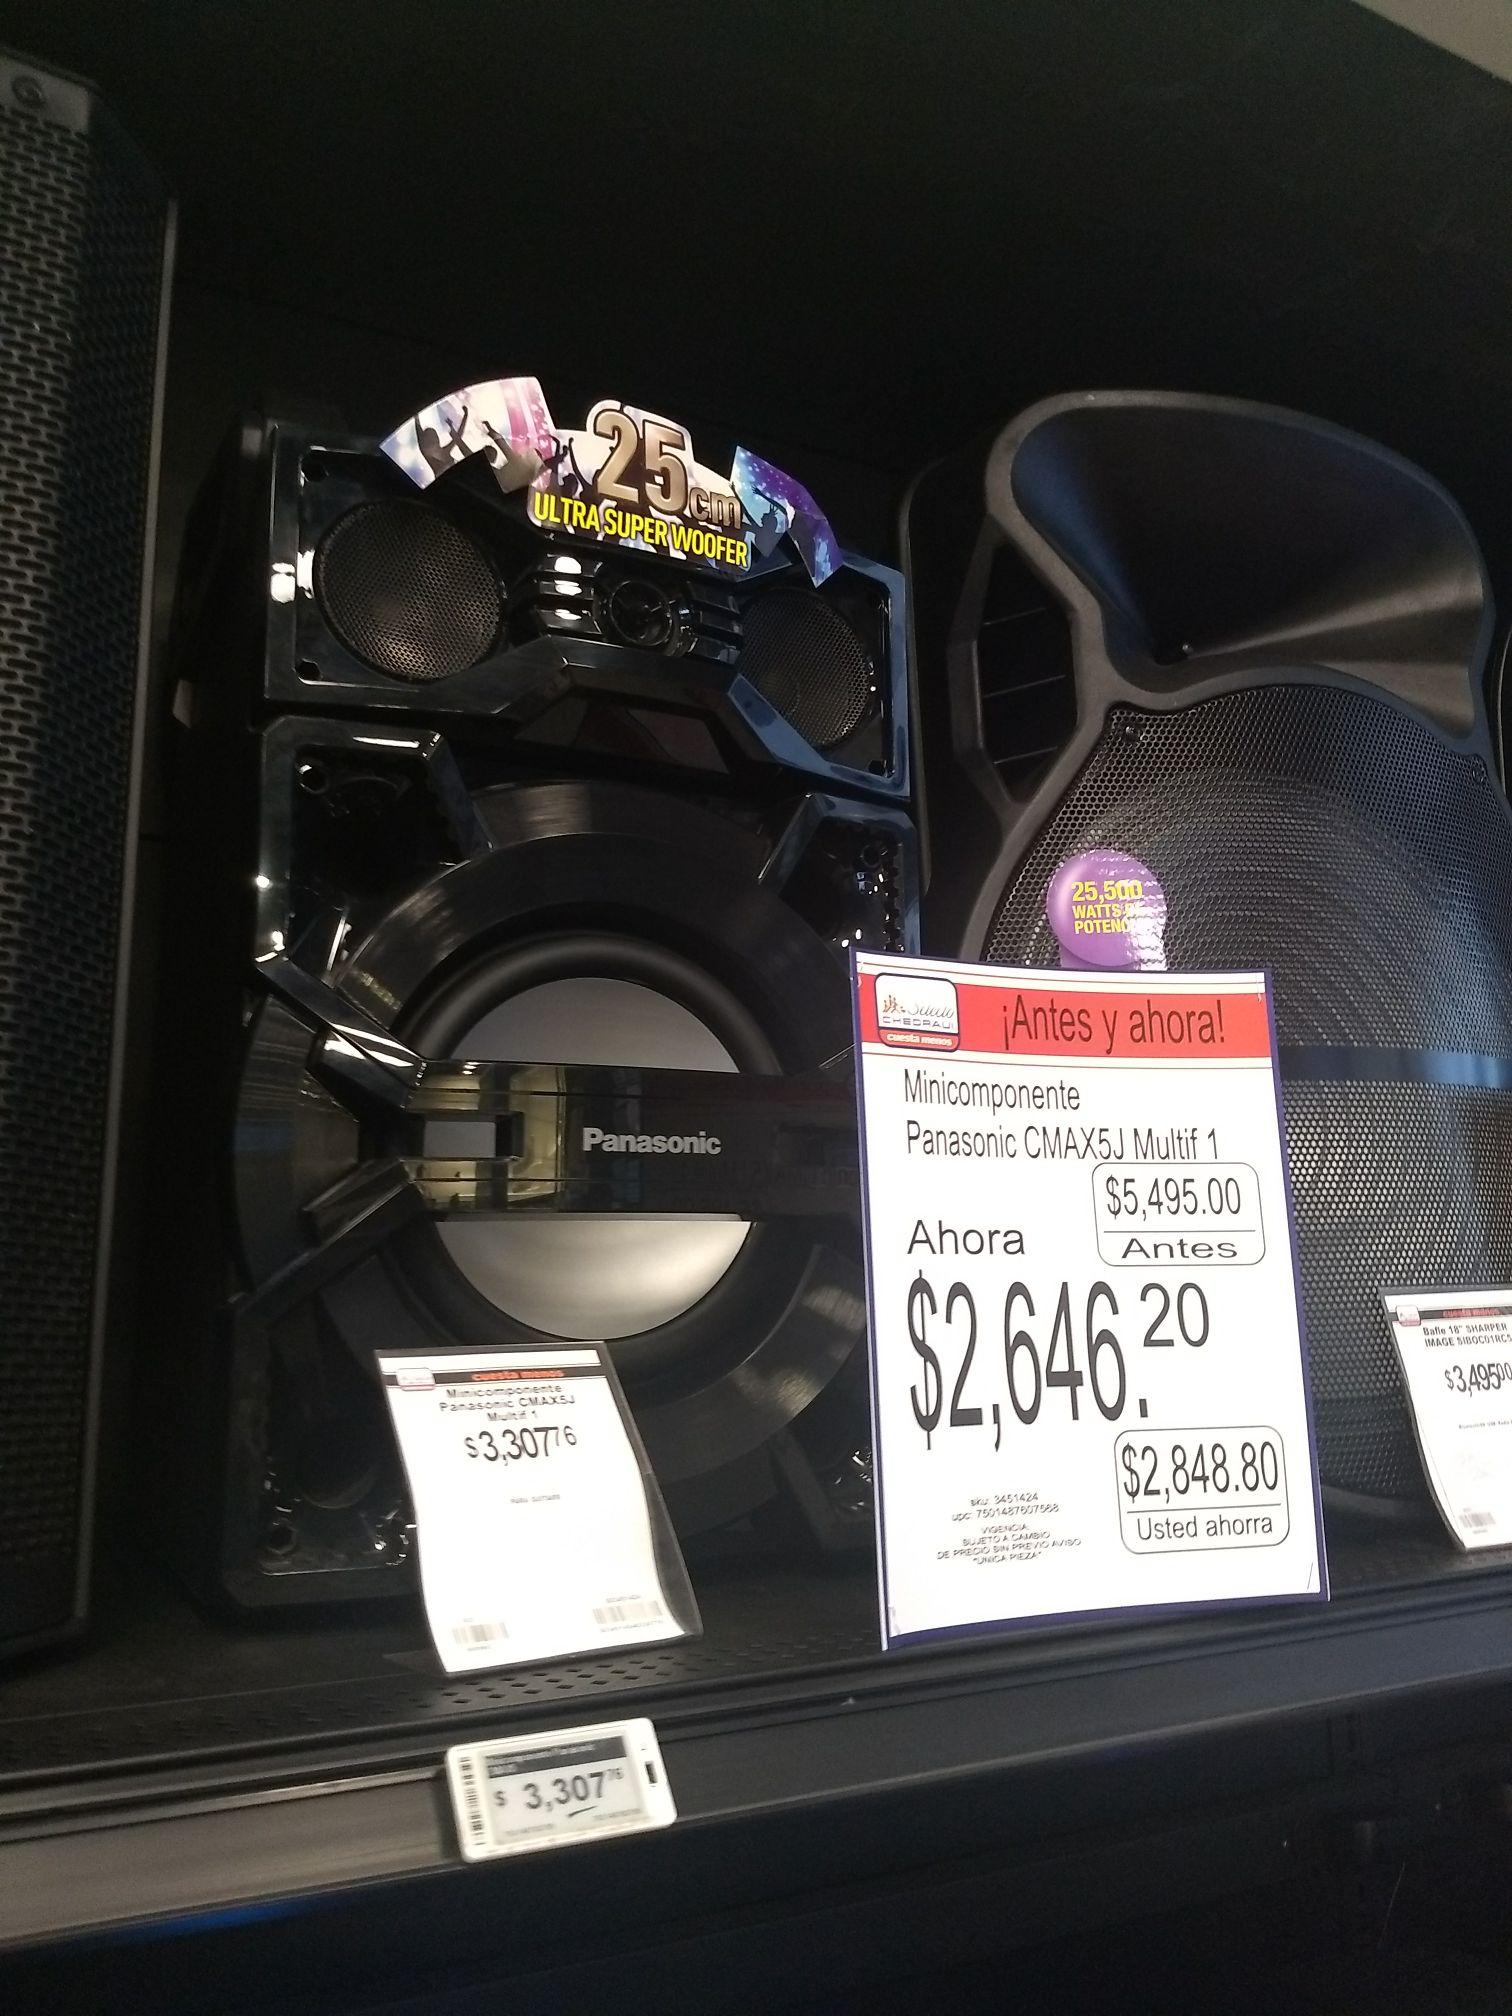 Chedraui Selecto Angelópolis: Mini Componente Panasonic CMAX5J a $2,646